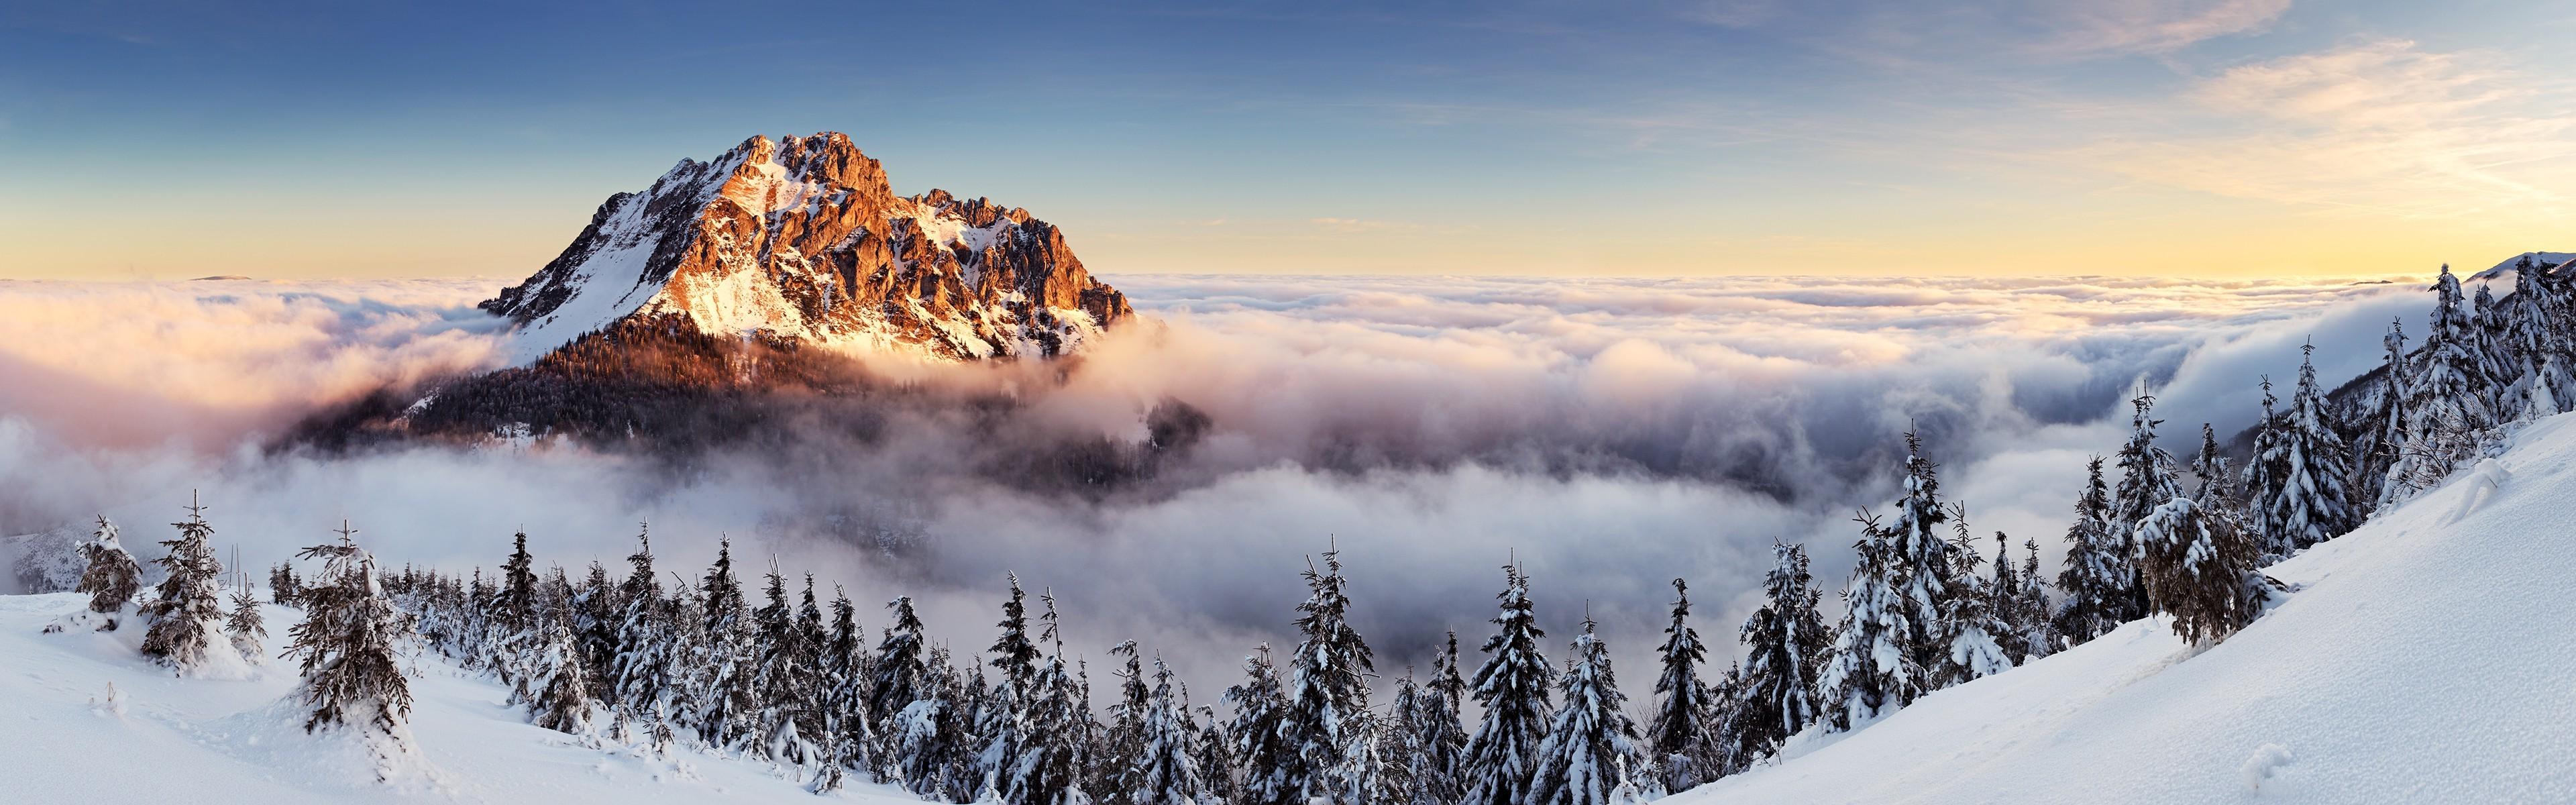 3840x1200 Px Landscape Mist Mountain Multiple Display Pine Trees Slovakia Winter